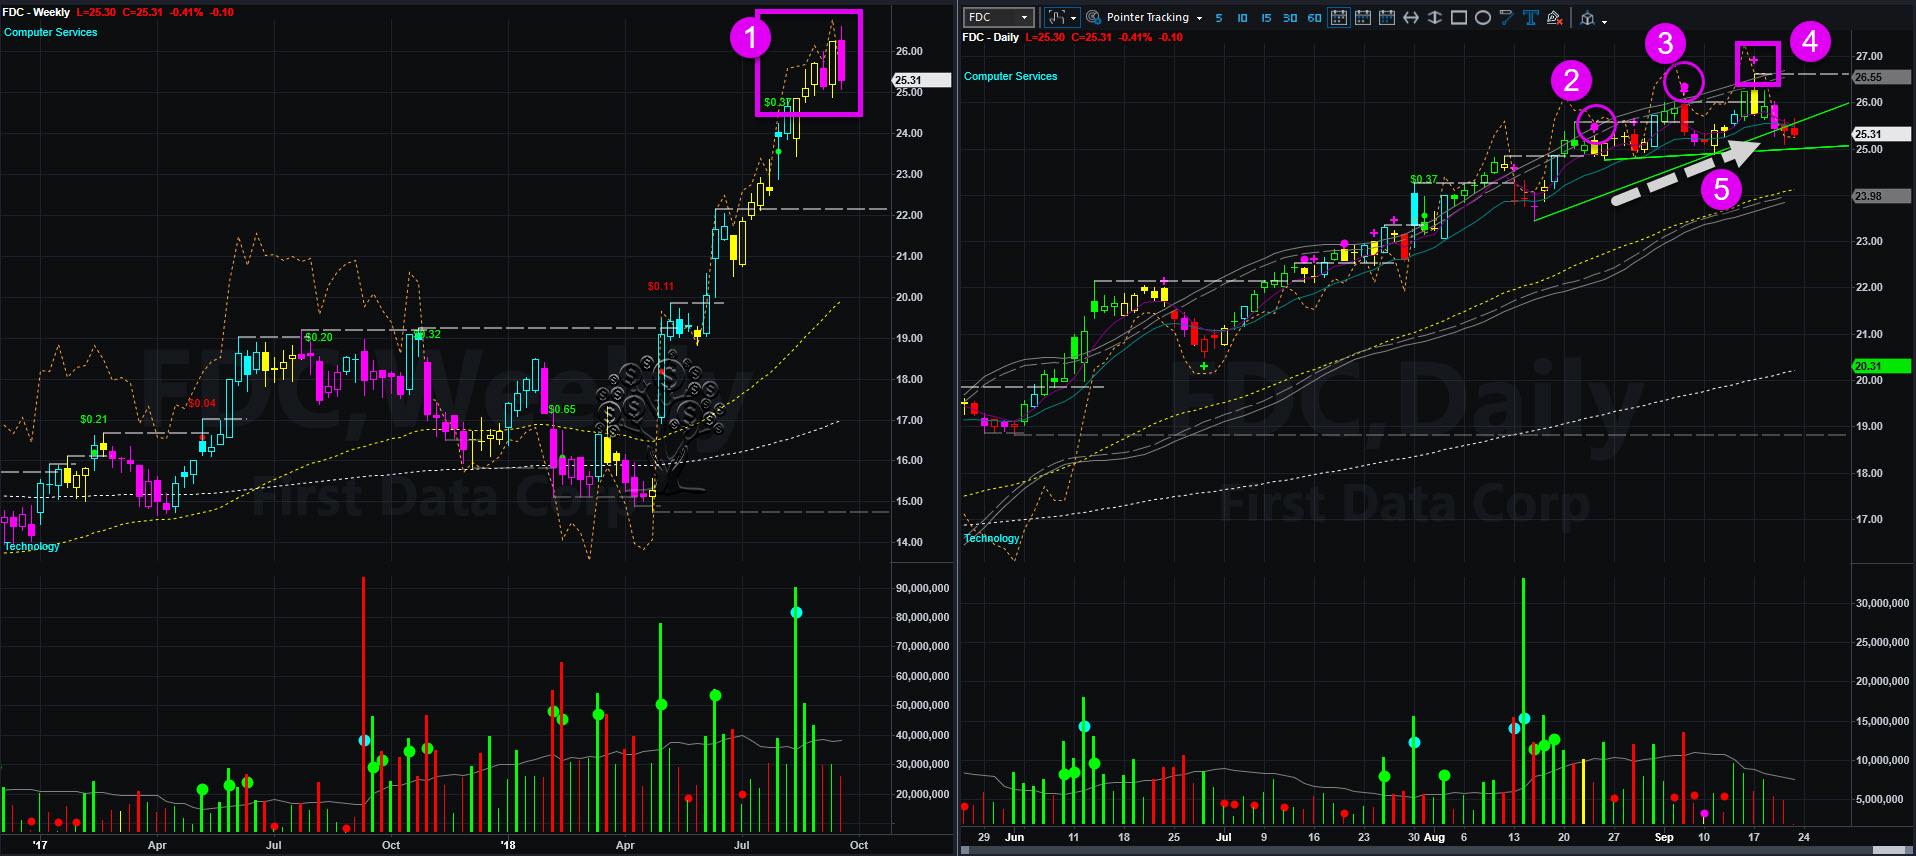 FDC chart 2018-09-21_12-41-13.jpg